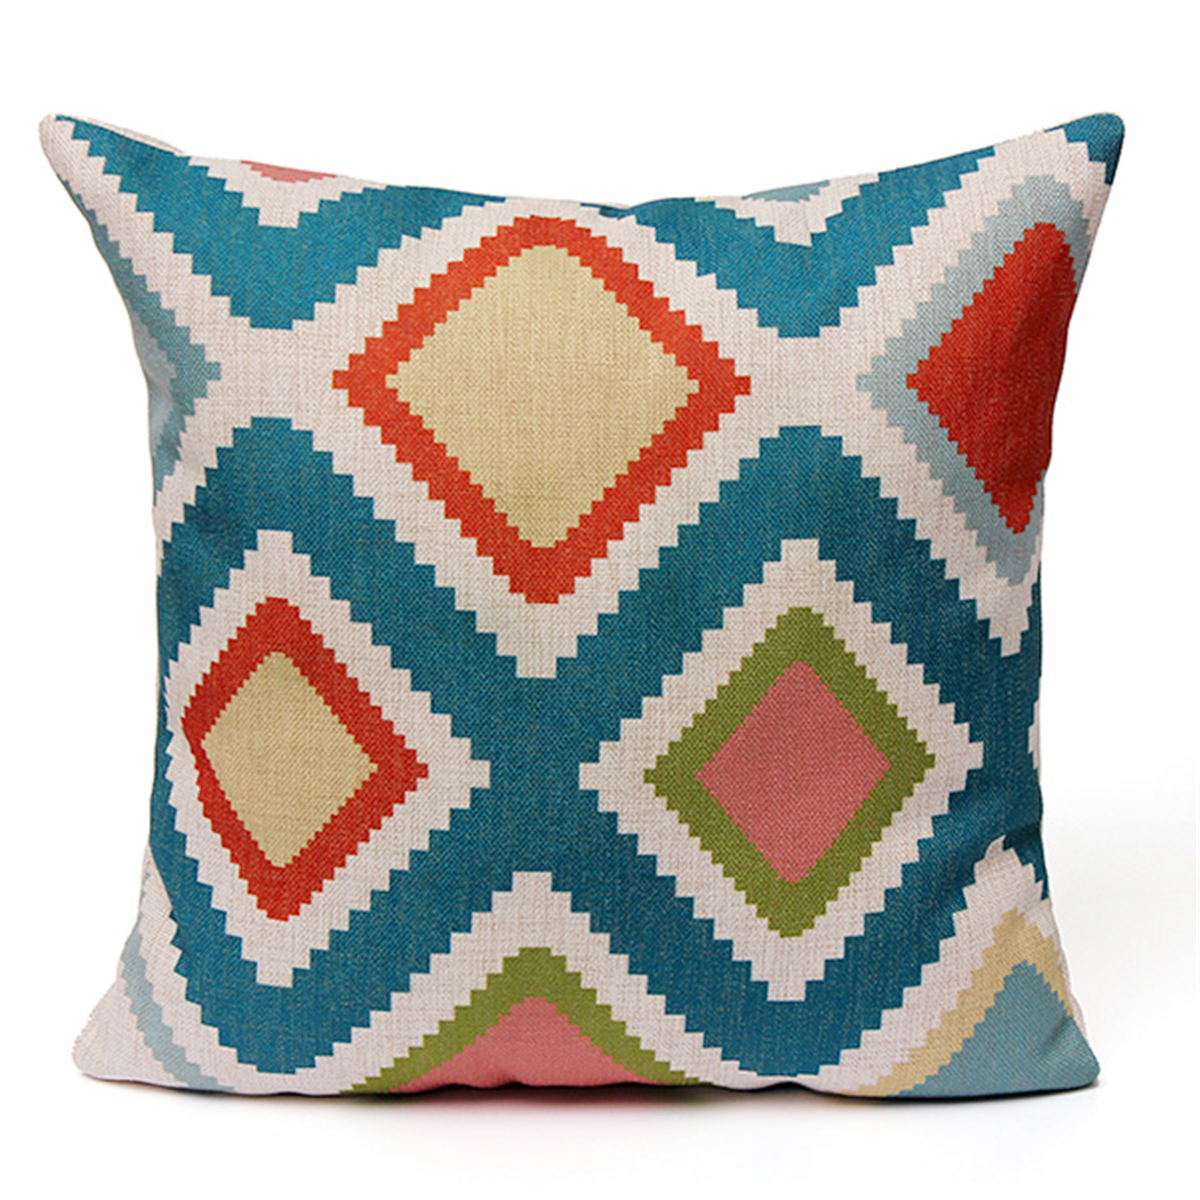 Geometric Stripe Wave Zig Zag Pillow Case Cushion Cover Linen Cotton Home